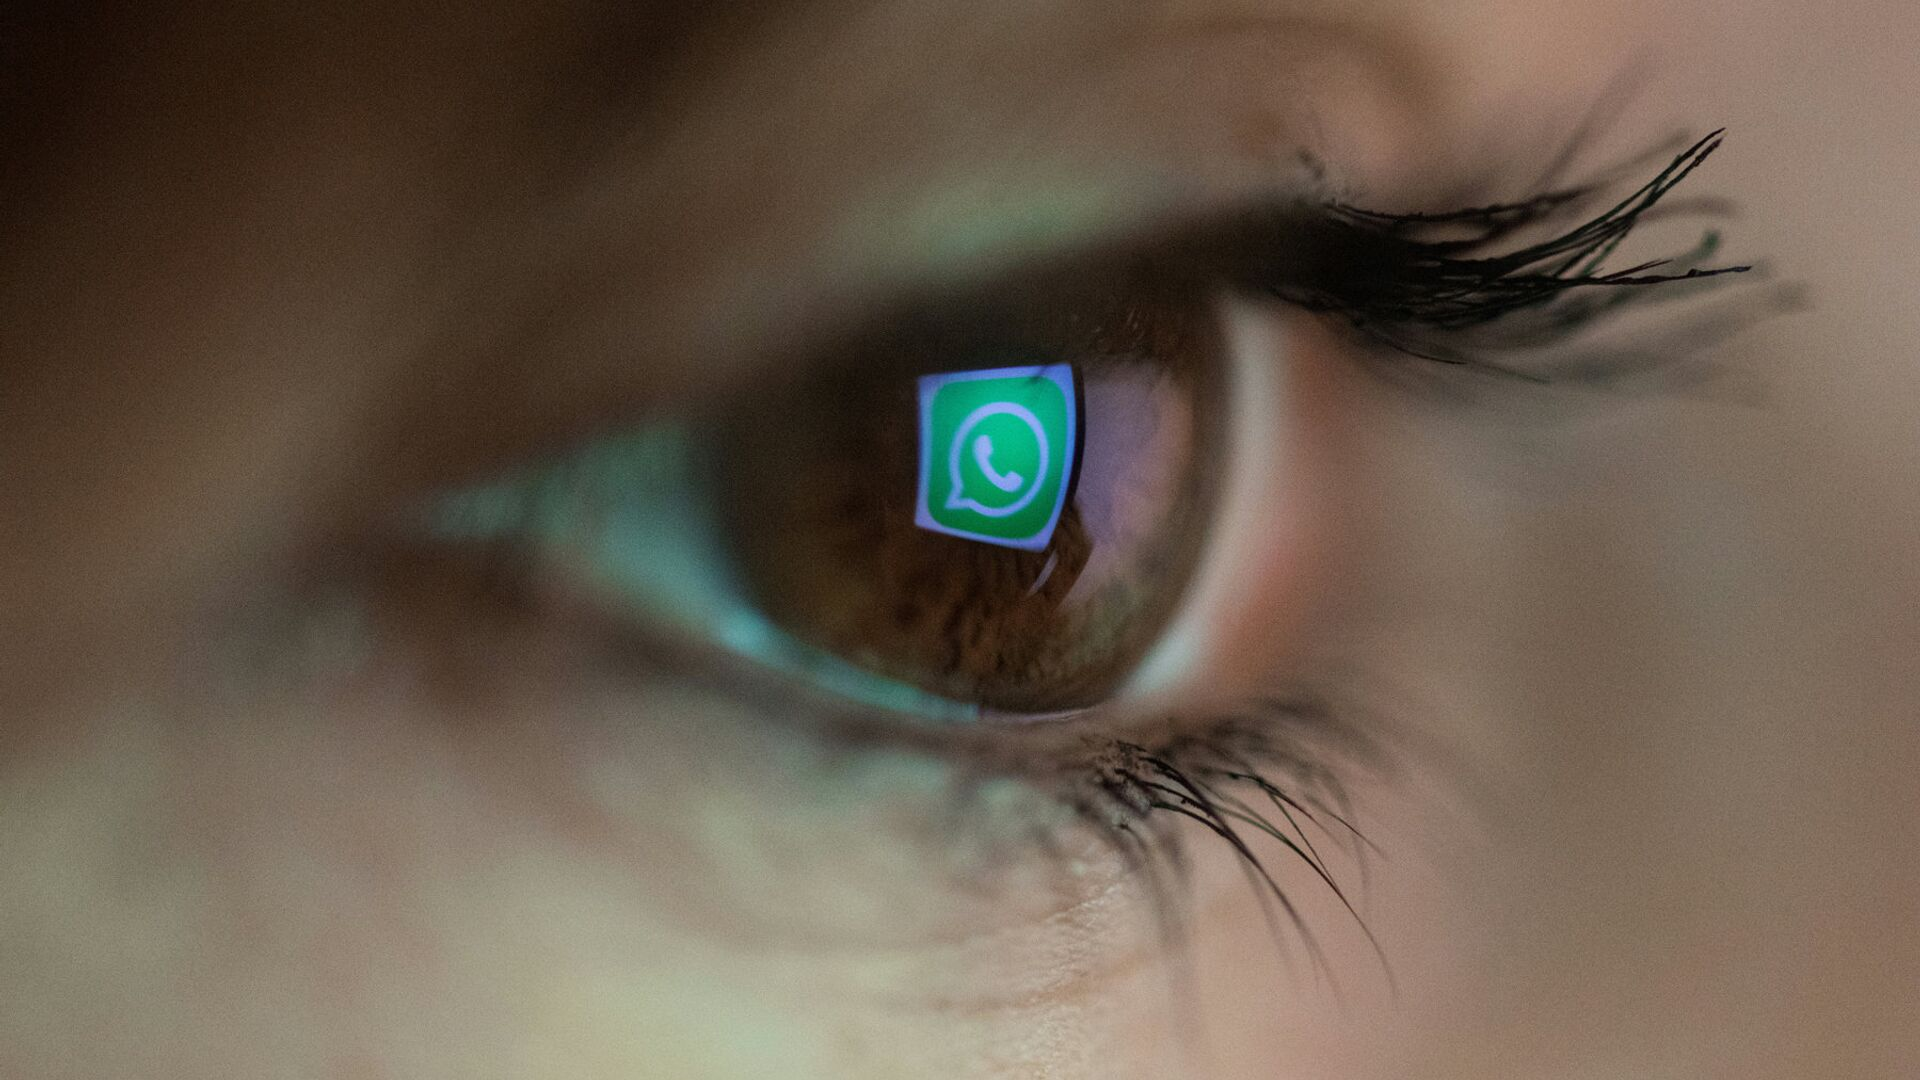 Логотип мессенджера WhatsApp - РИА Новости, 1920, 16.09.2021